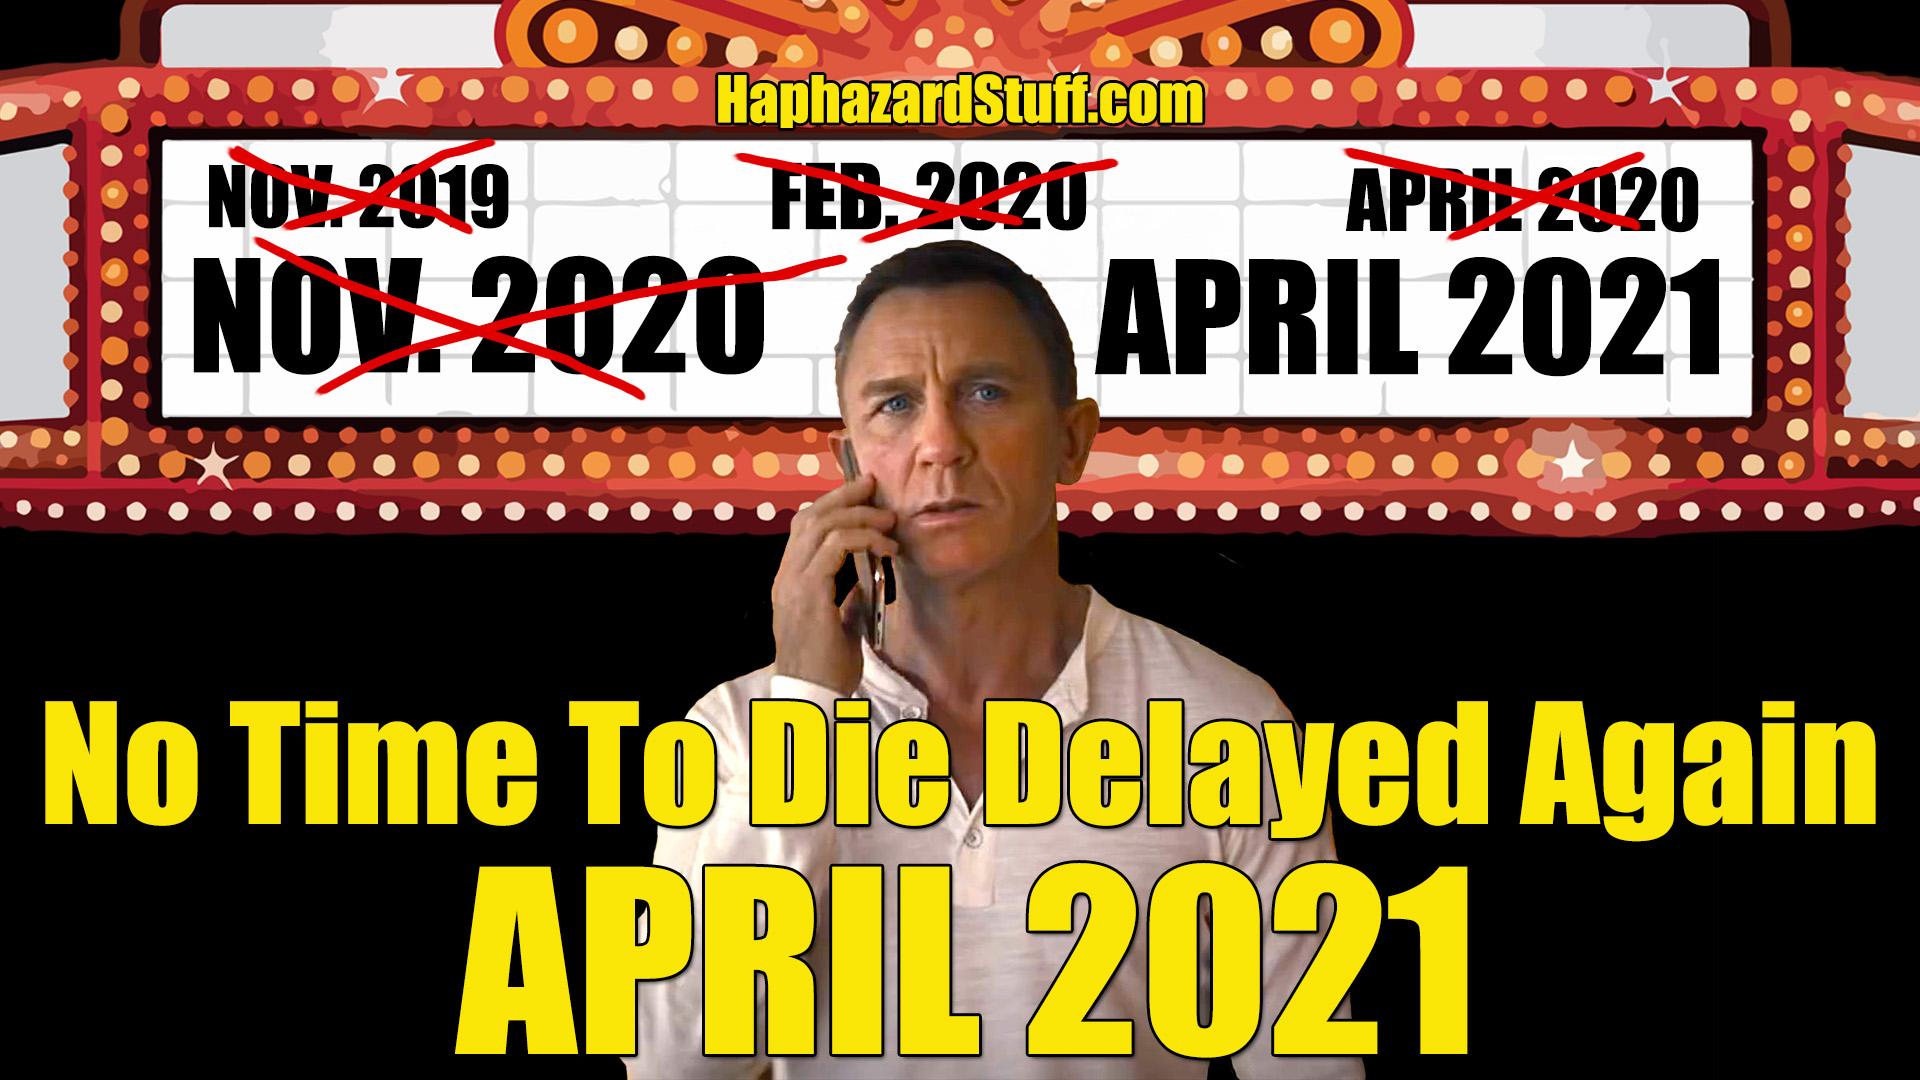 No Time To Die Delay April 2020 James Bond HaphazardStuff